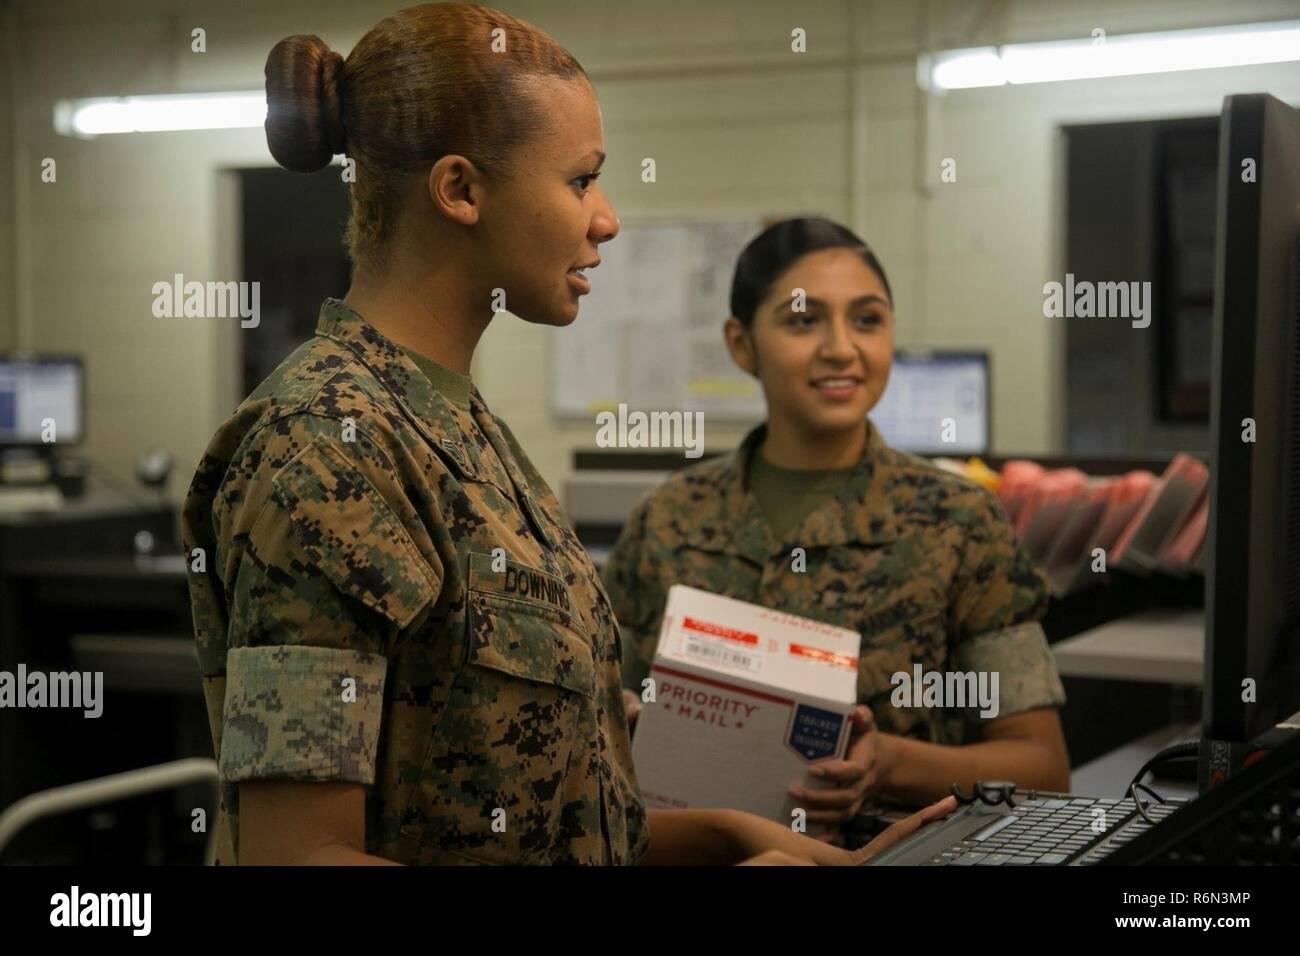 CAMP KINSER, OKINAWA, Japan – Staff Sgt  Tina Downing, left, teaches